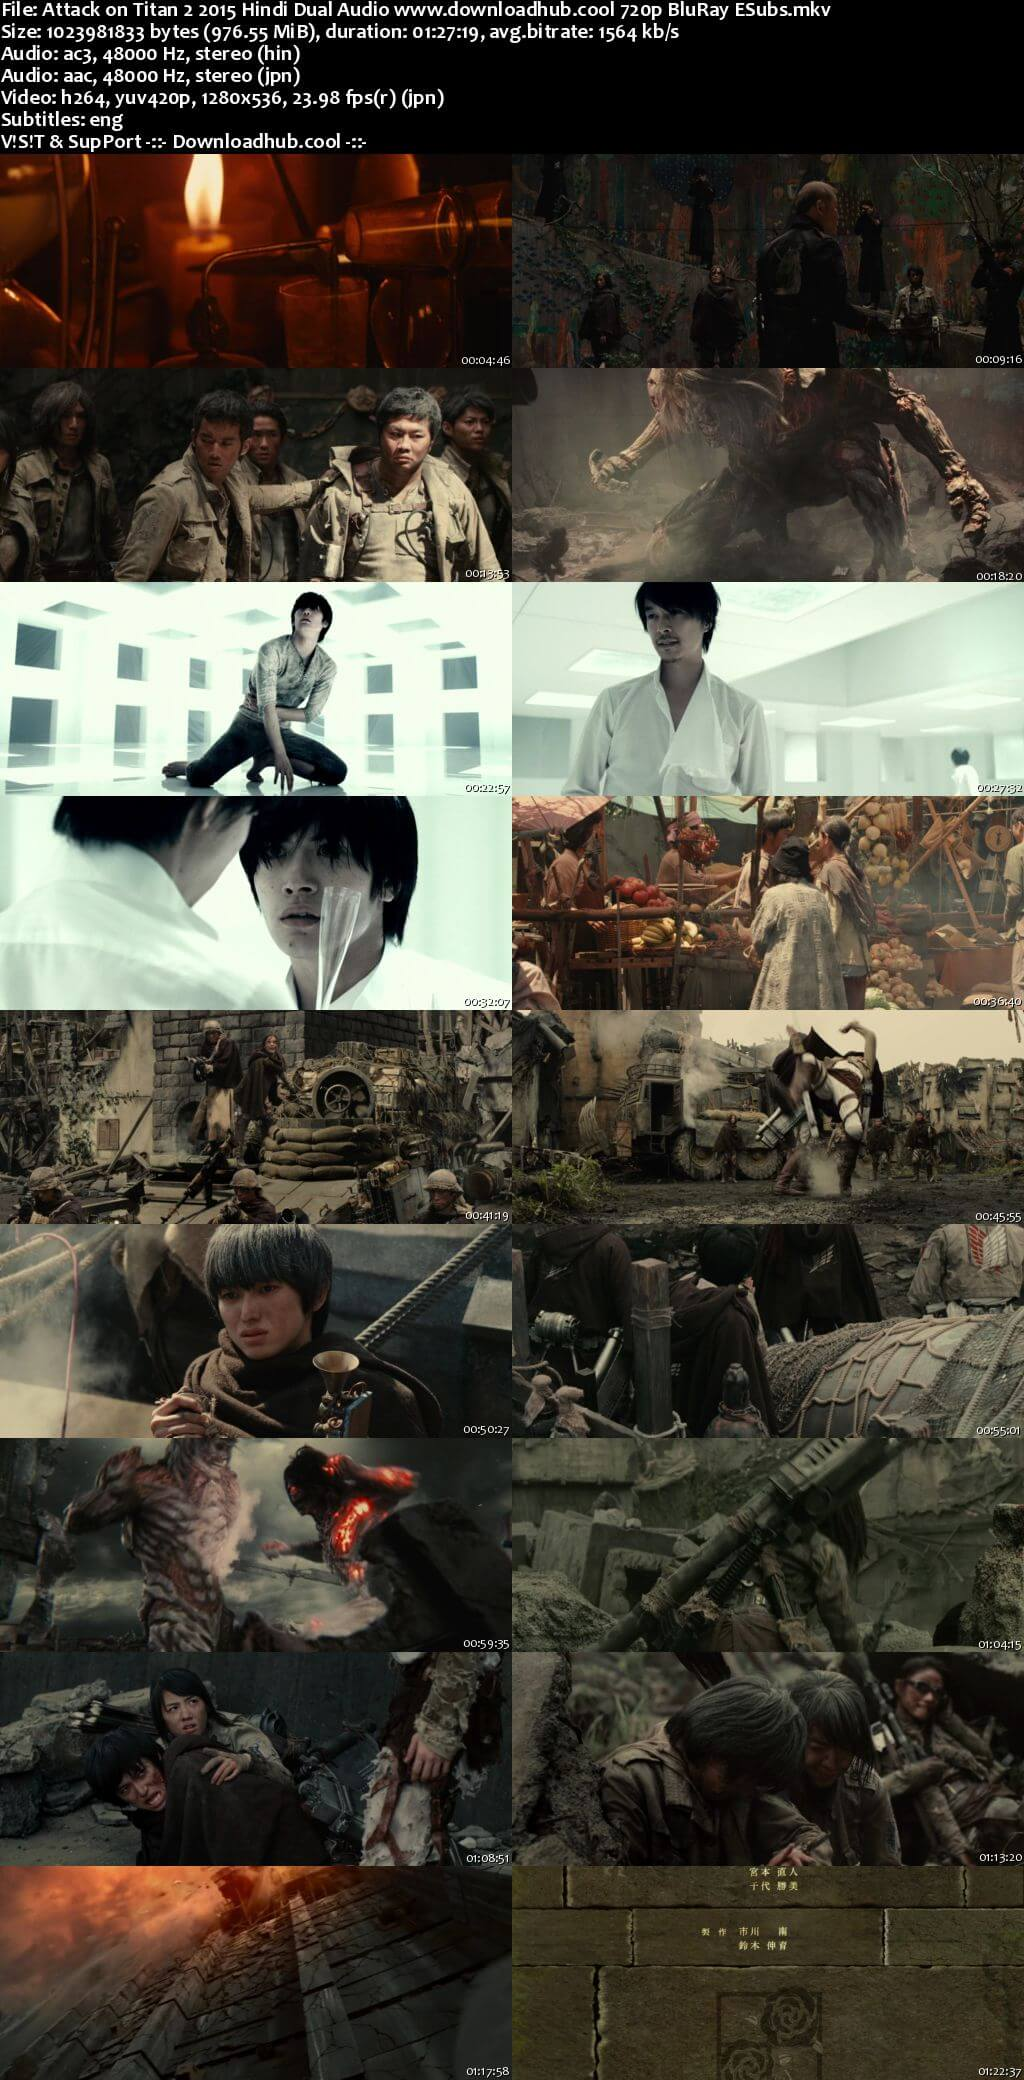 Attack on Titan 2 2015 Hindi Dual Audio 720p BluRay ESubs